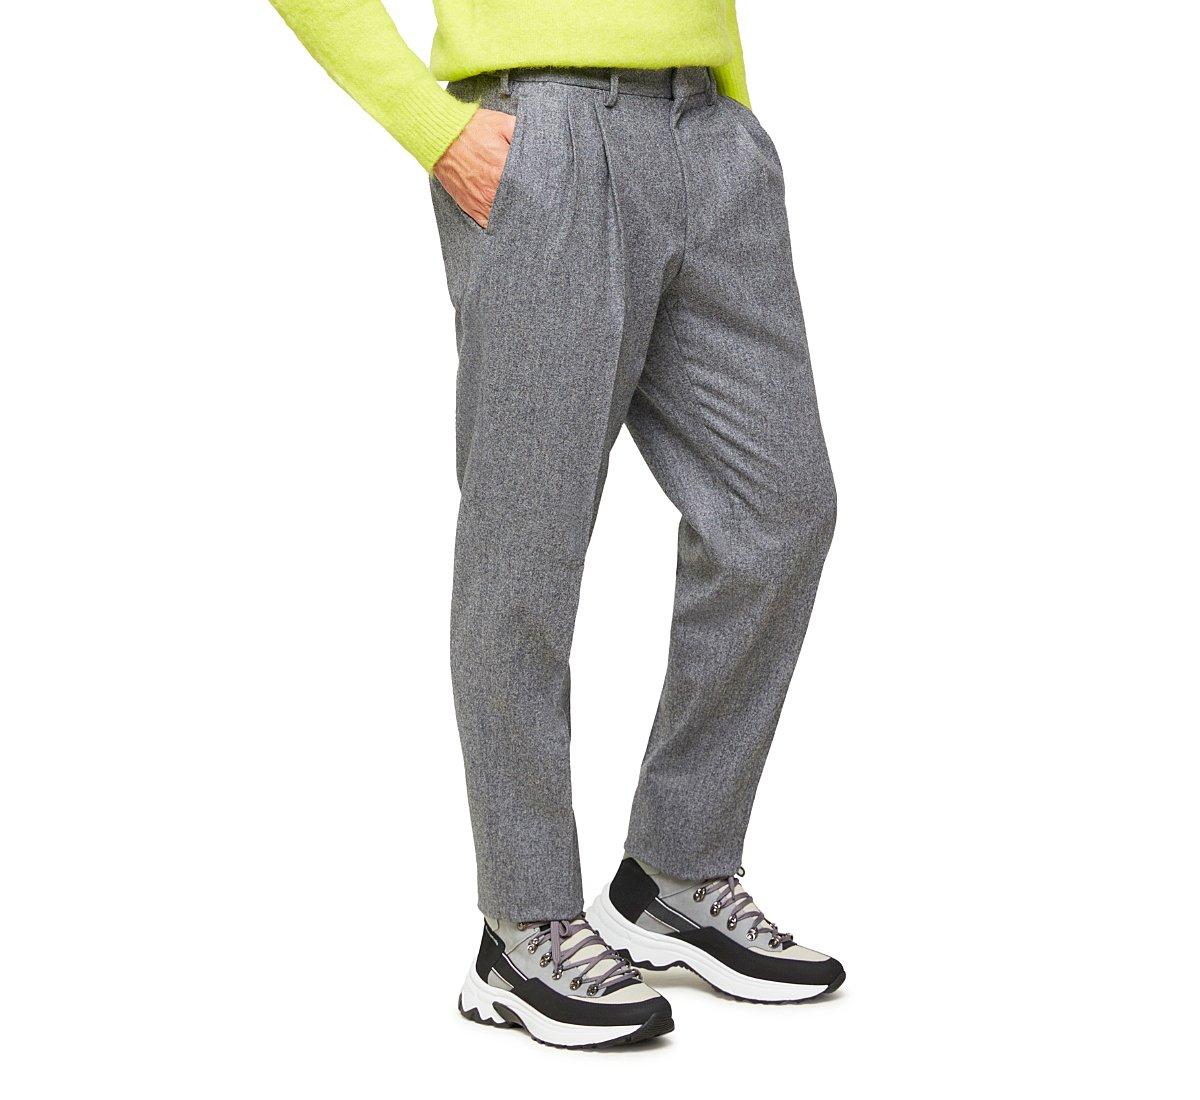 Wool trousers